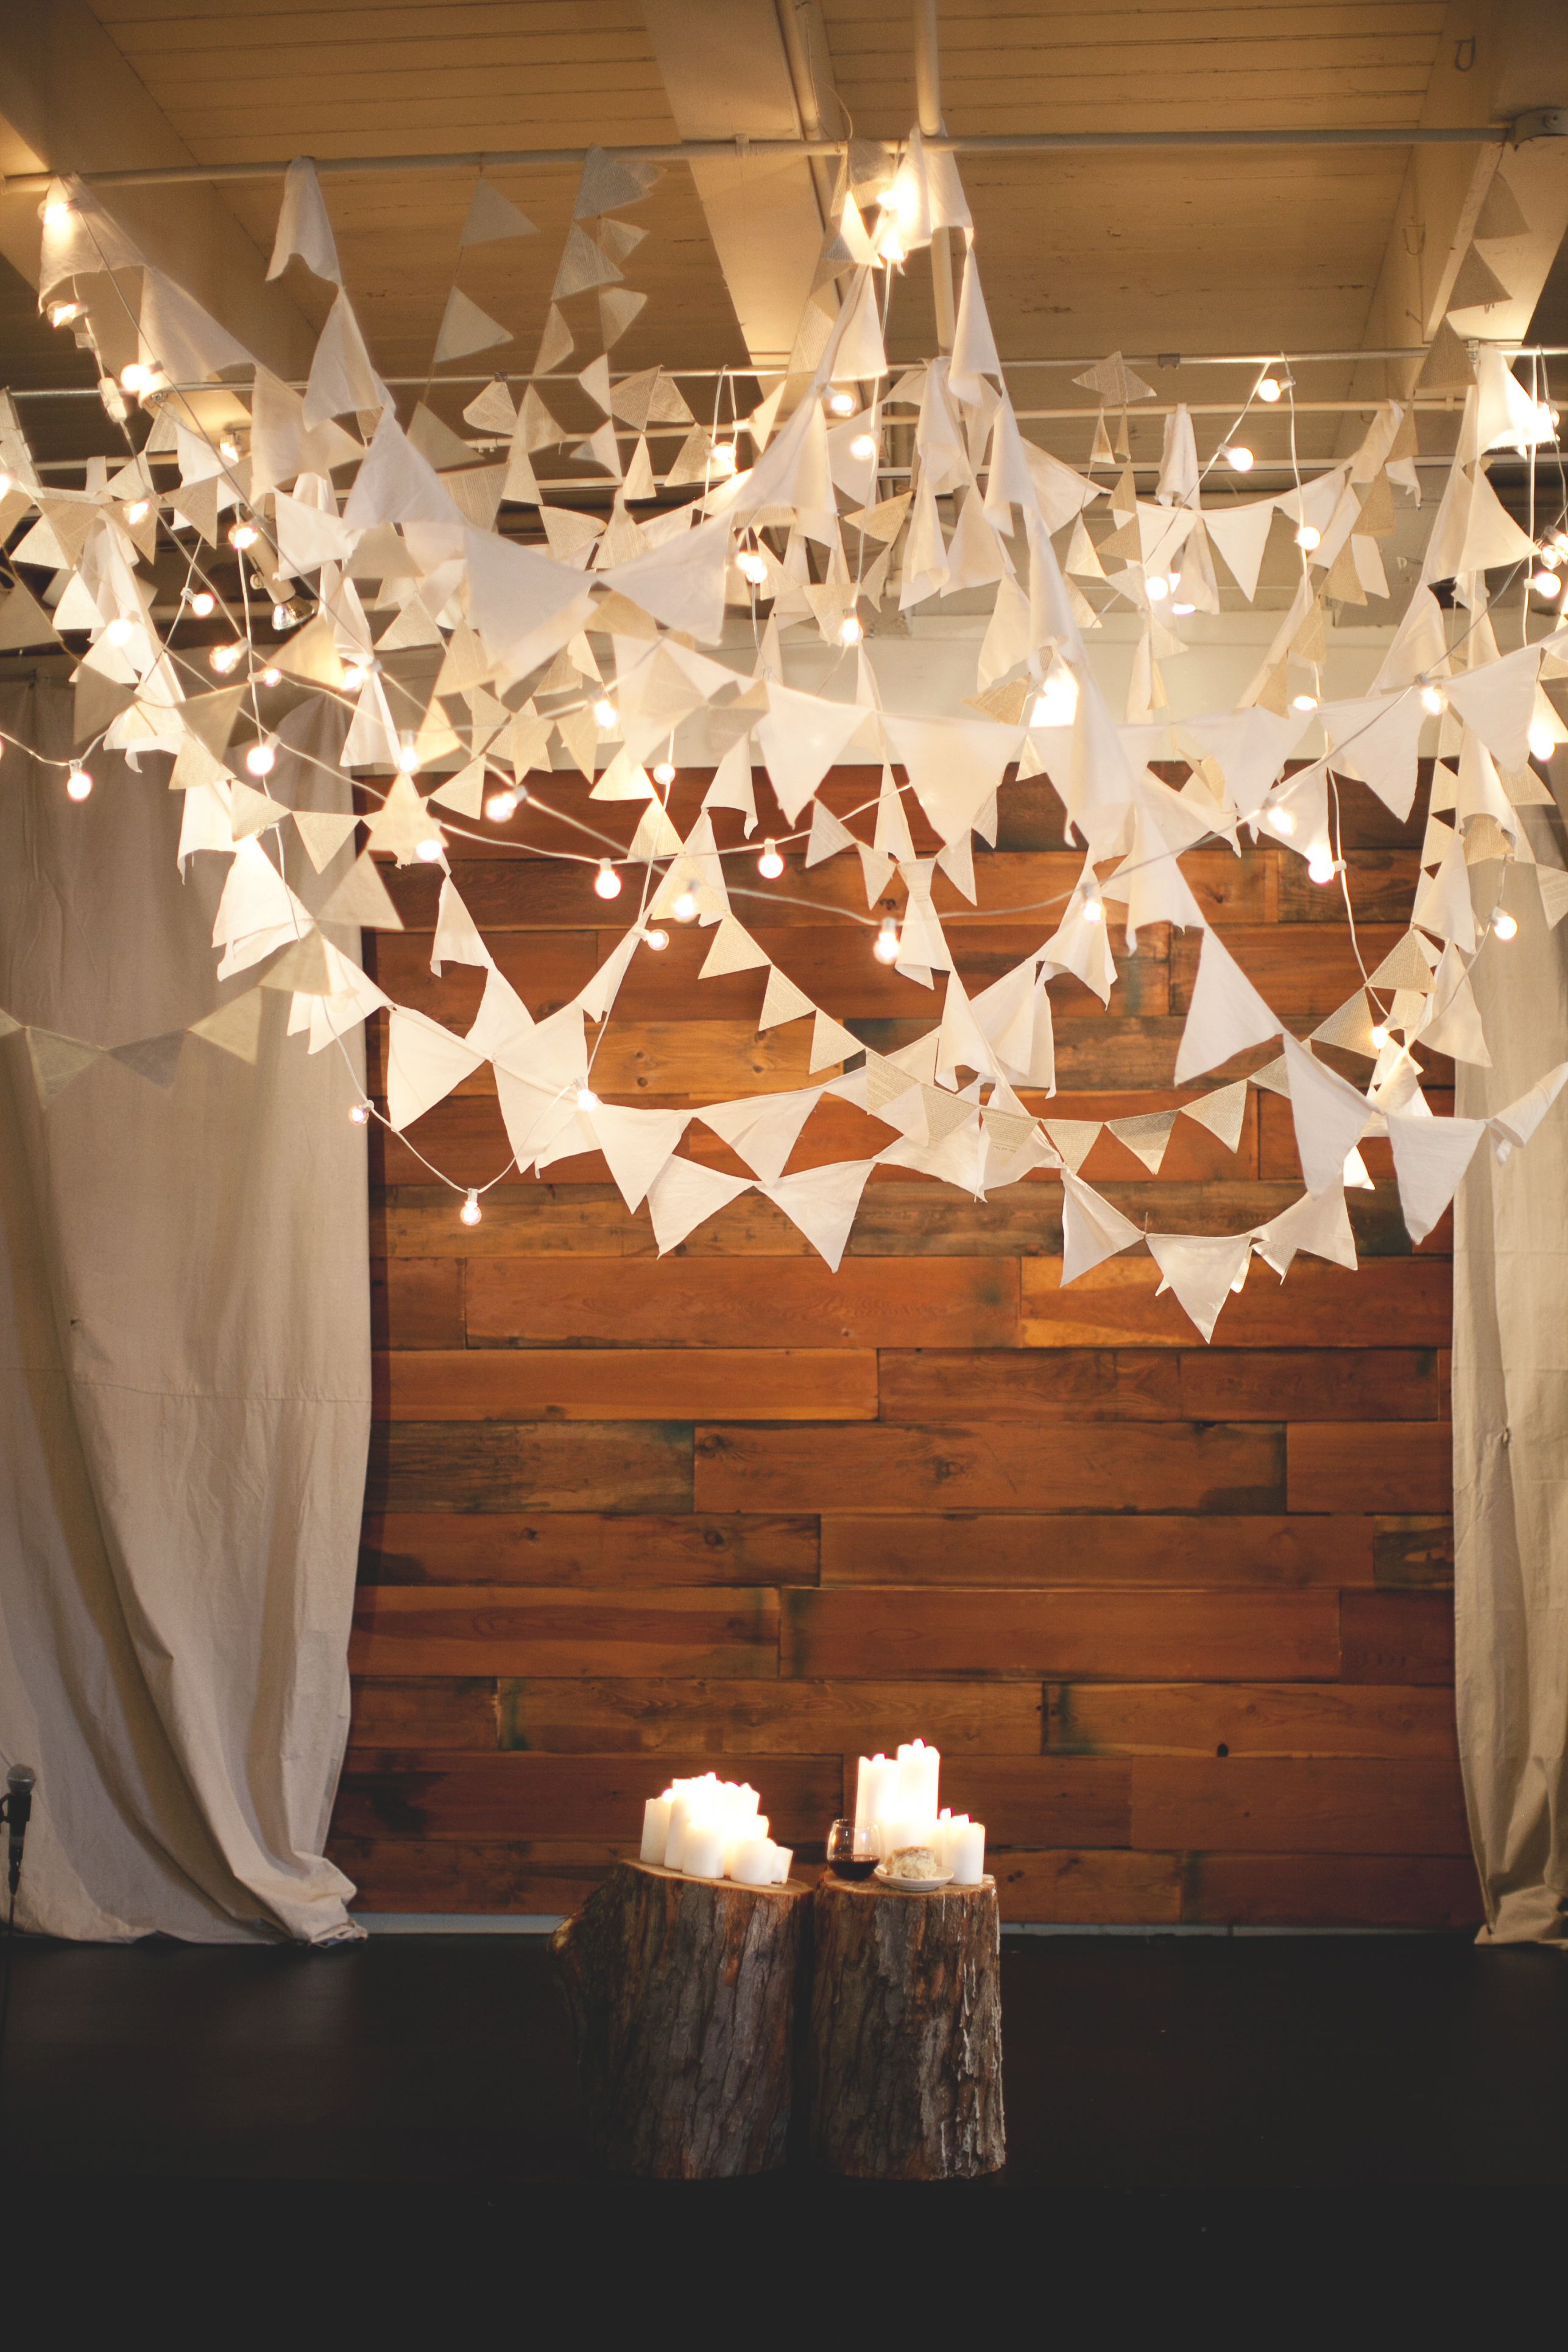 Rustic Wedding Alter - white flags make me think of @Amy Lyons Lyons Lyons Cagulada